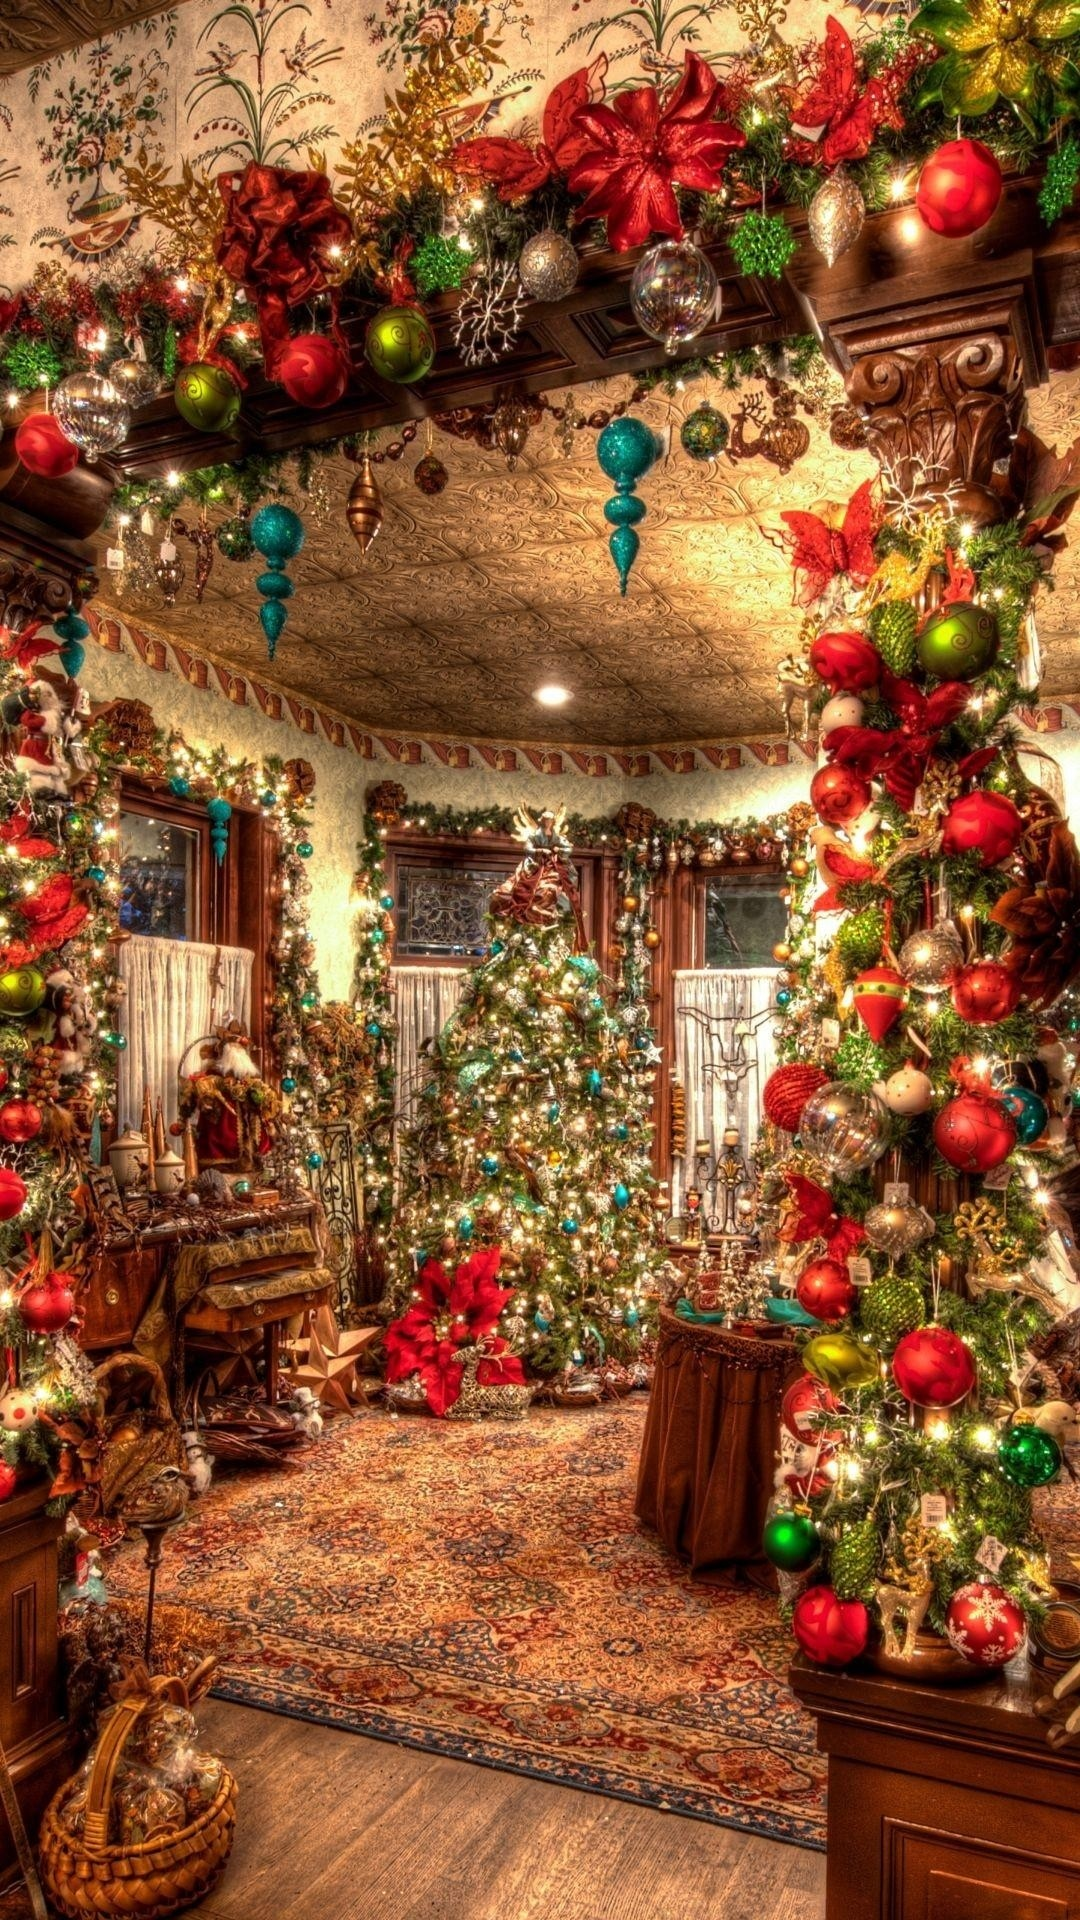 Wallpaper holiday, christmas, ornaments, toys, christmas tree